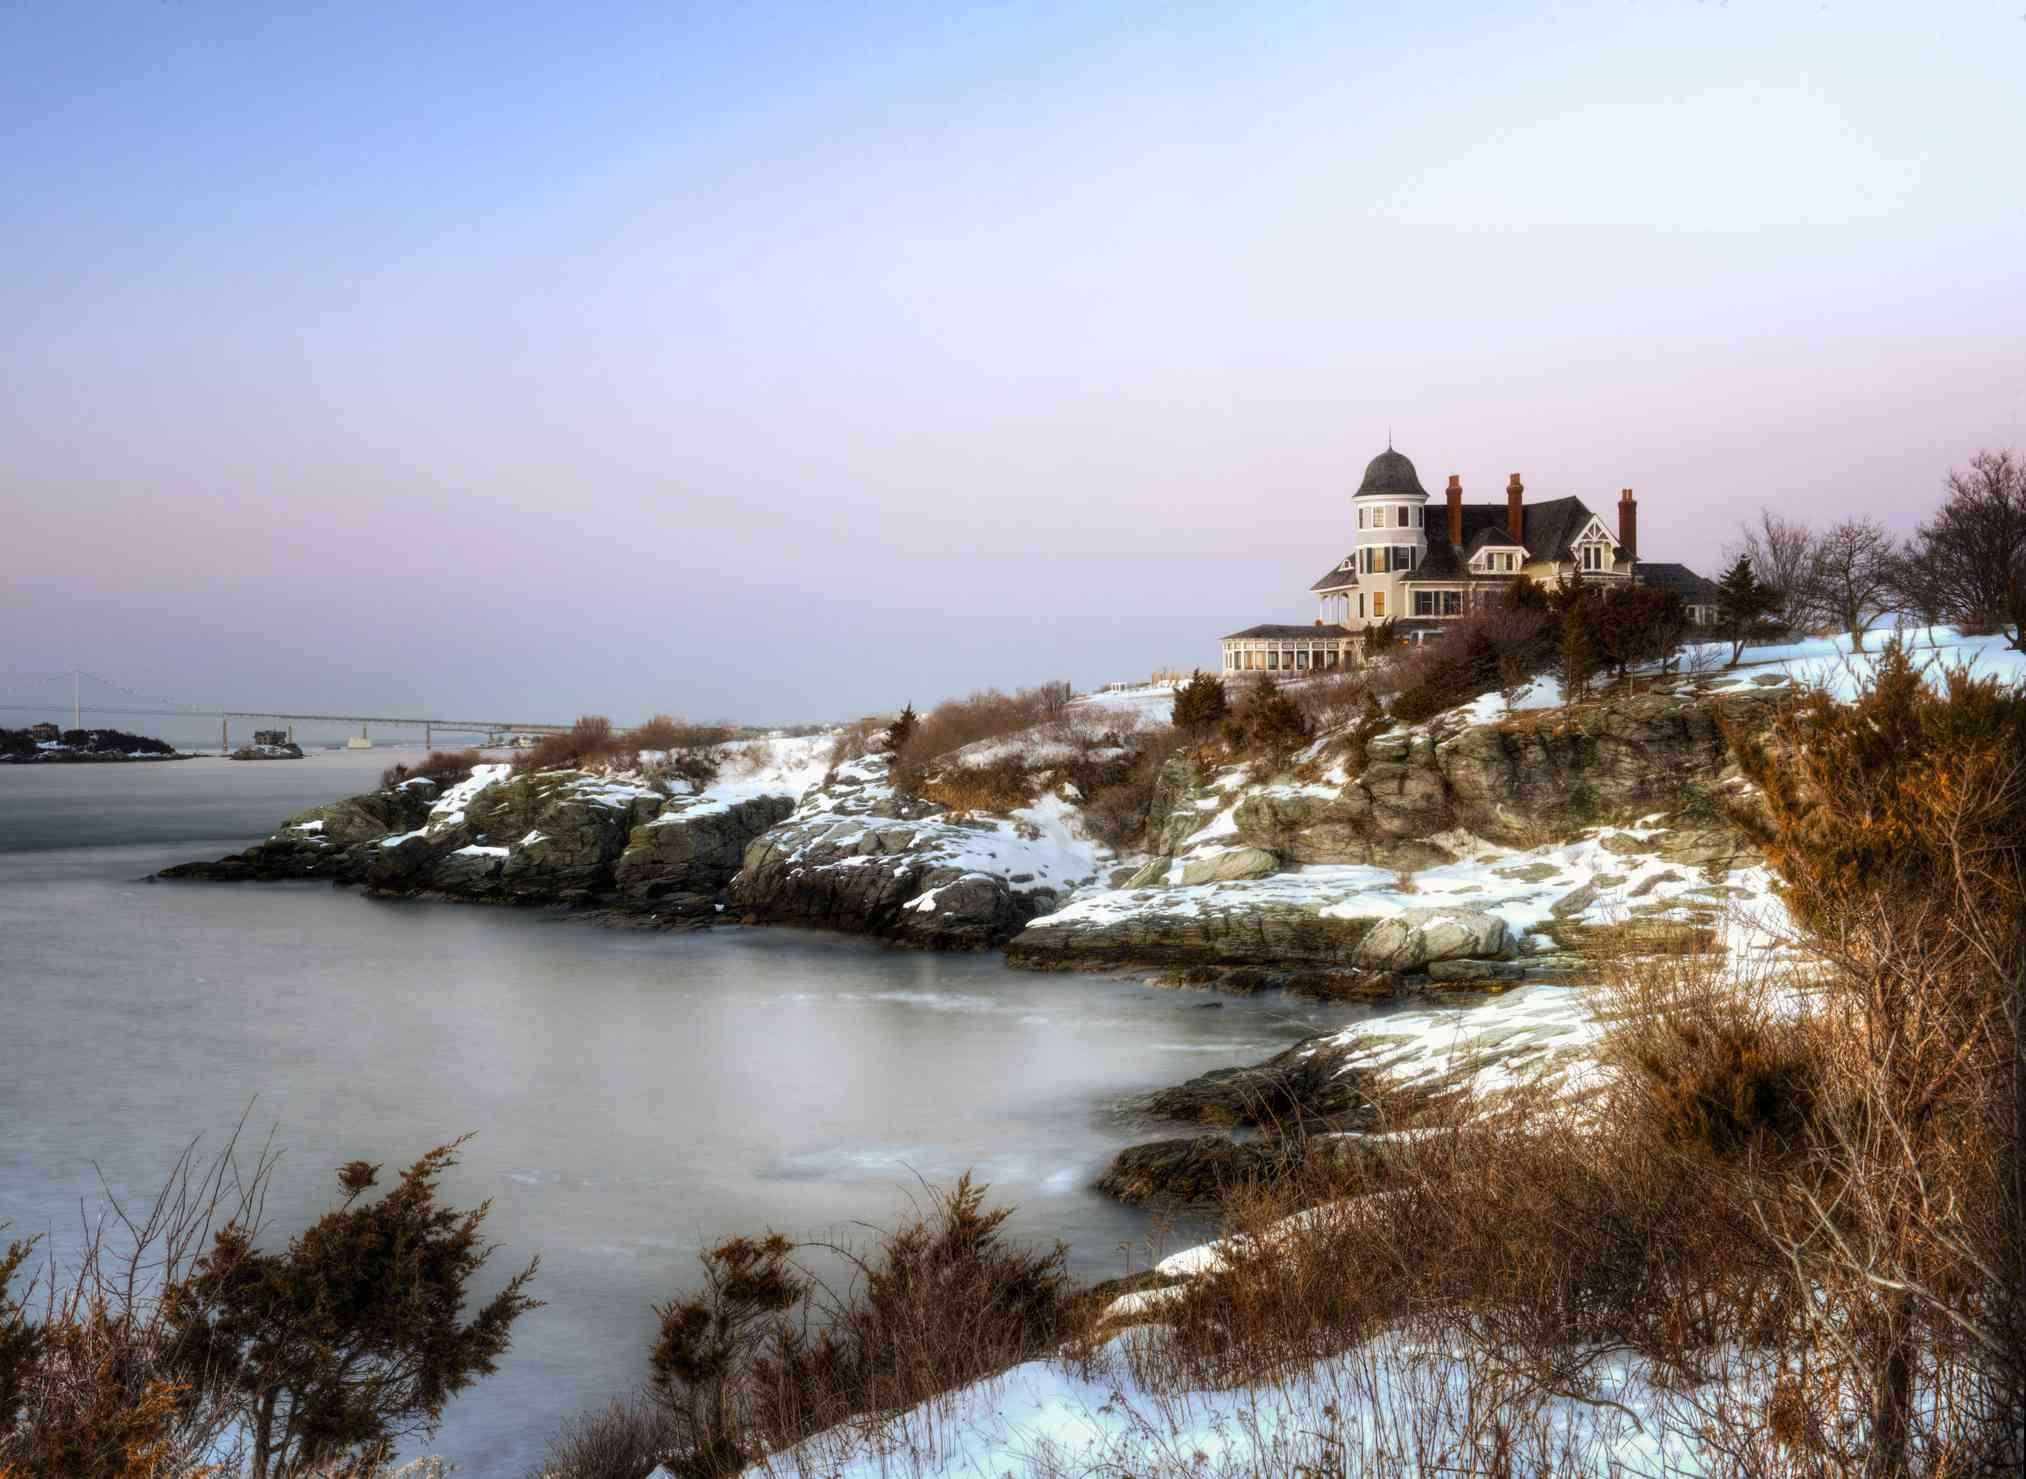 Castle Hill Inn along the snow covered shore, Newport Rhode Island